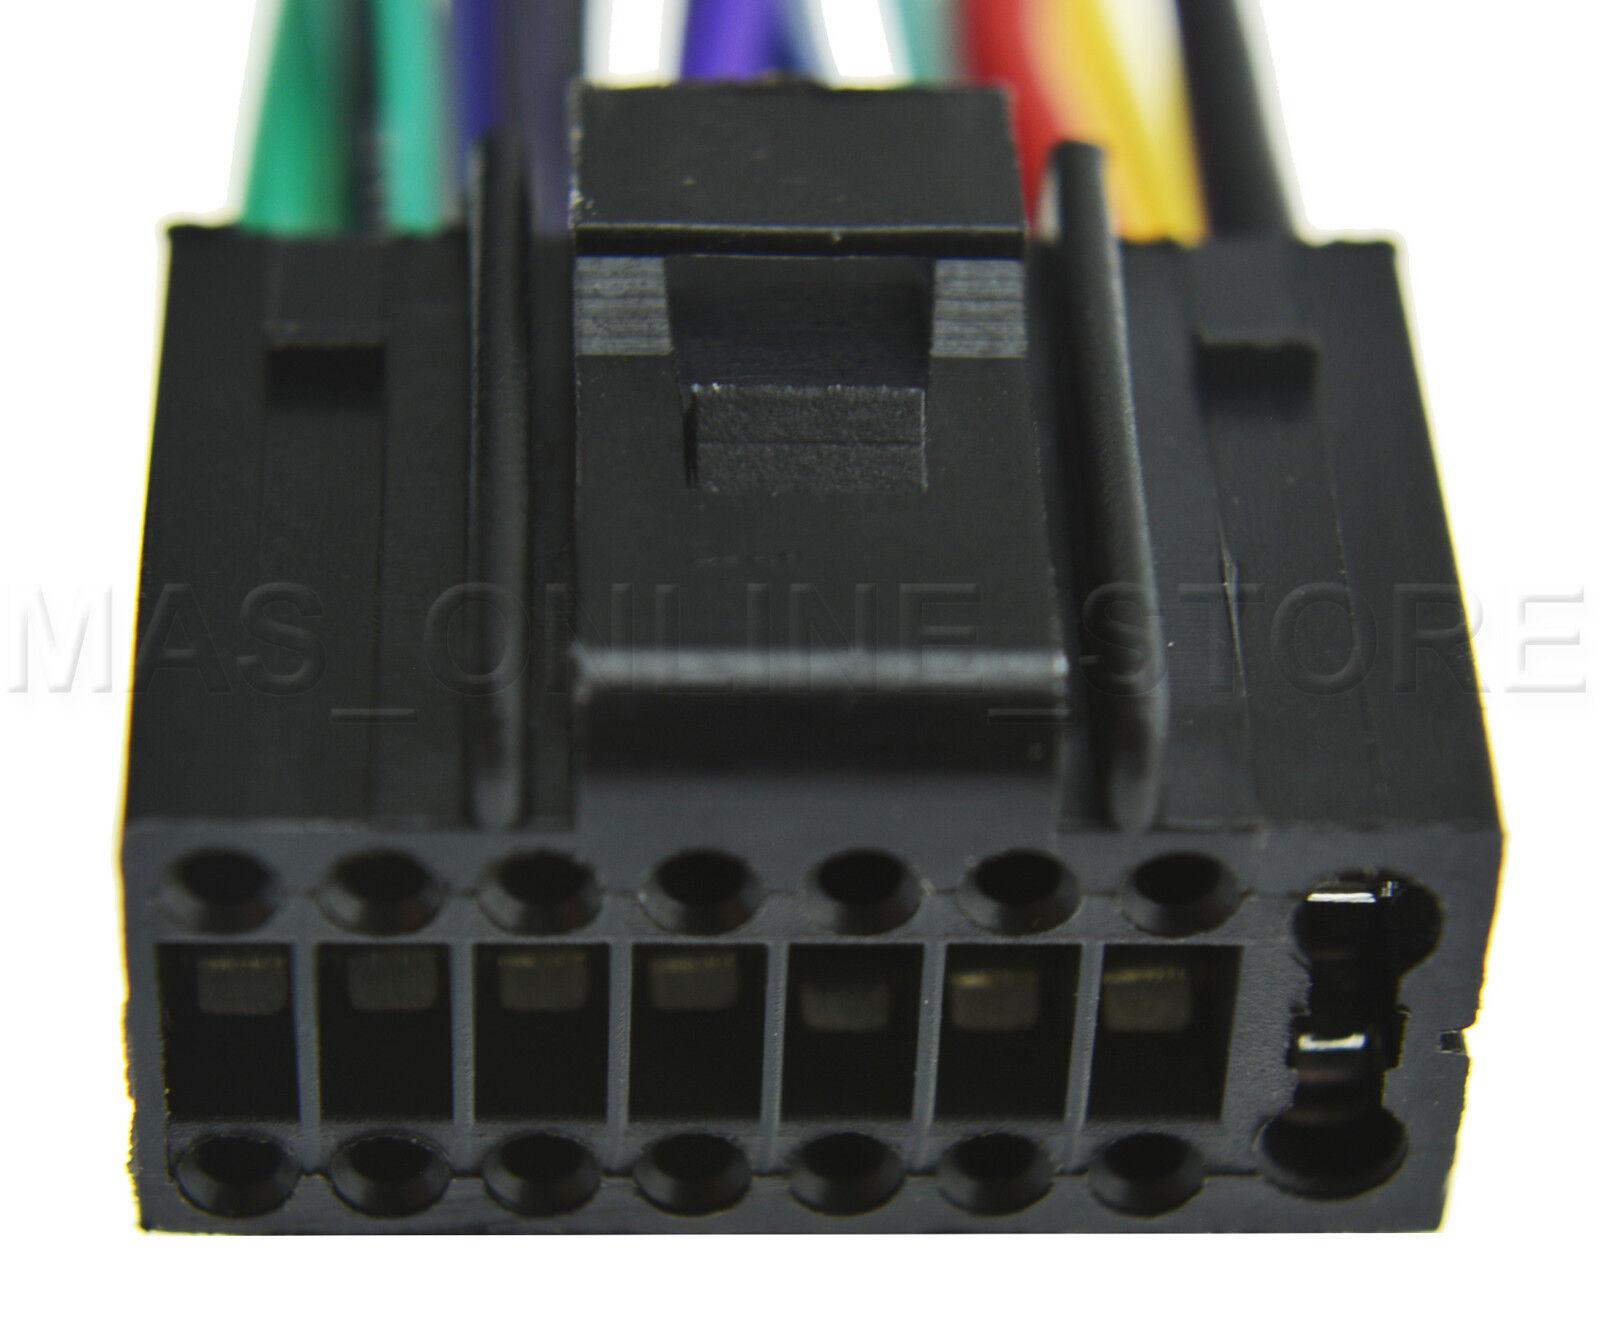 jvc kw av50 wiring harness diagram jvc kw